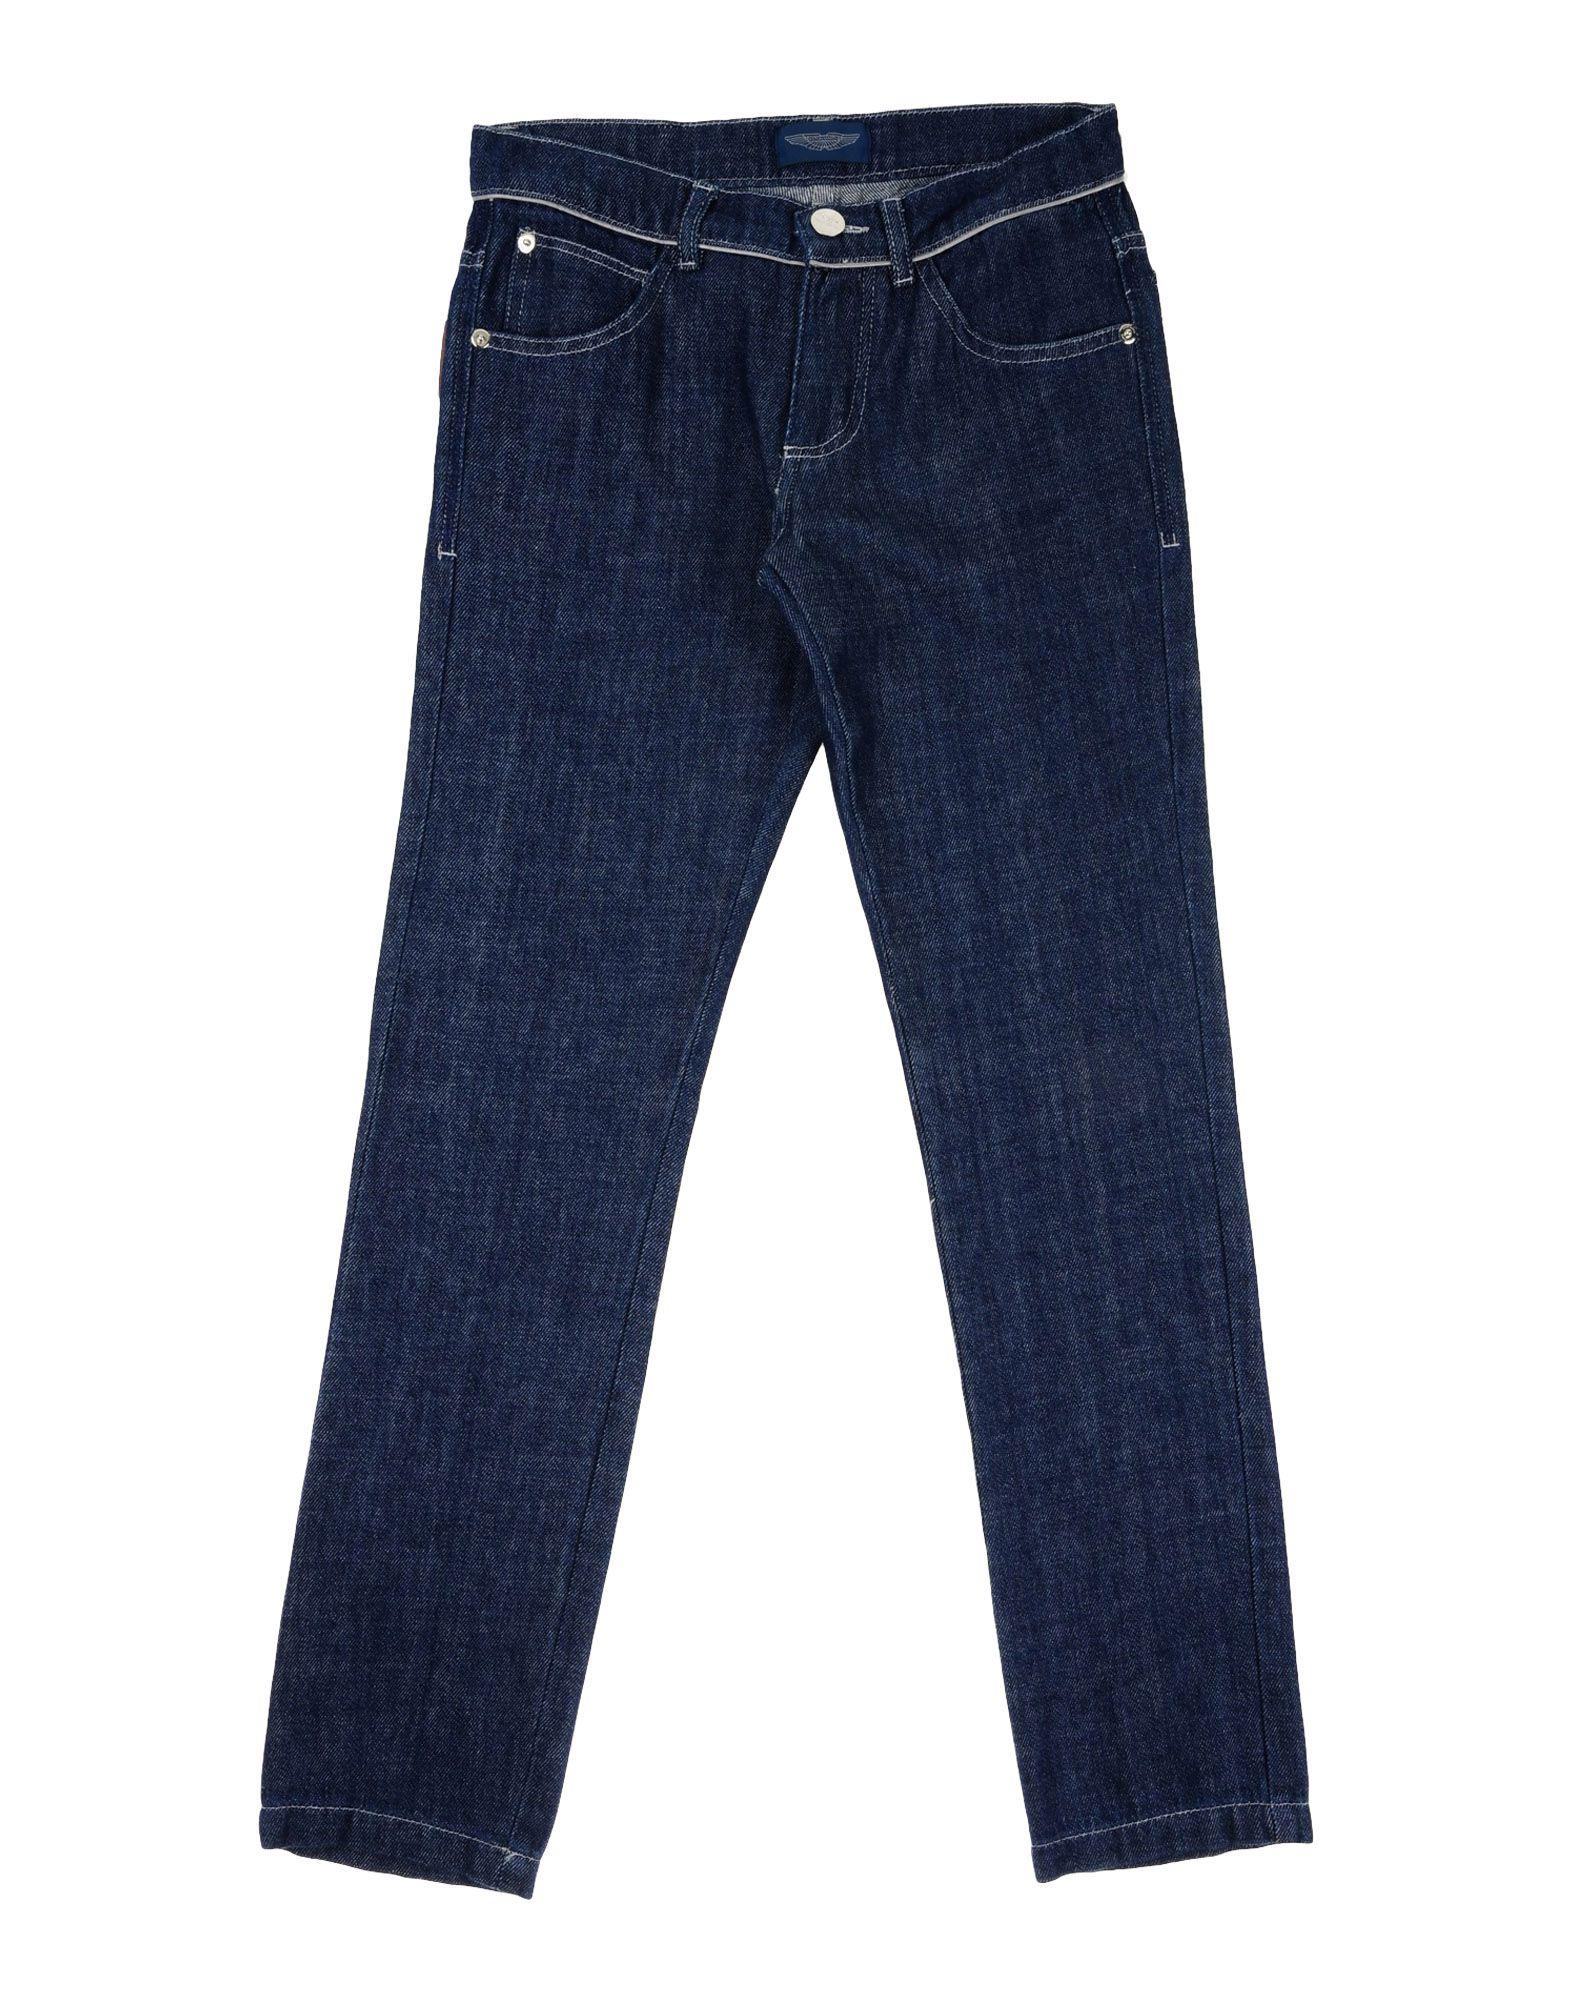 ASTON MARTIN Jeans